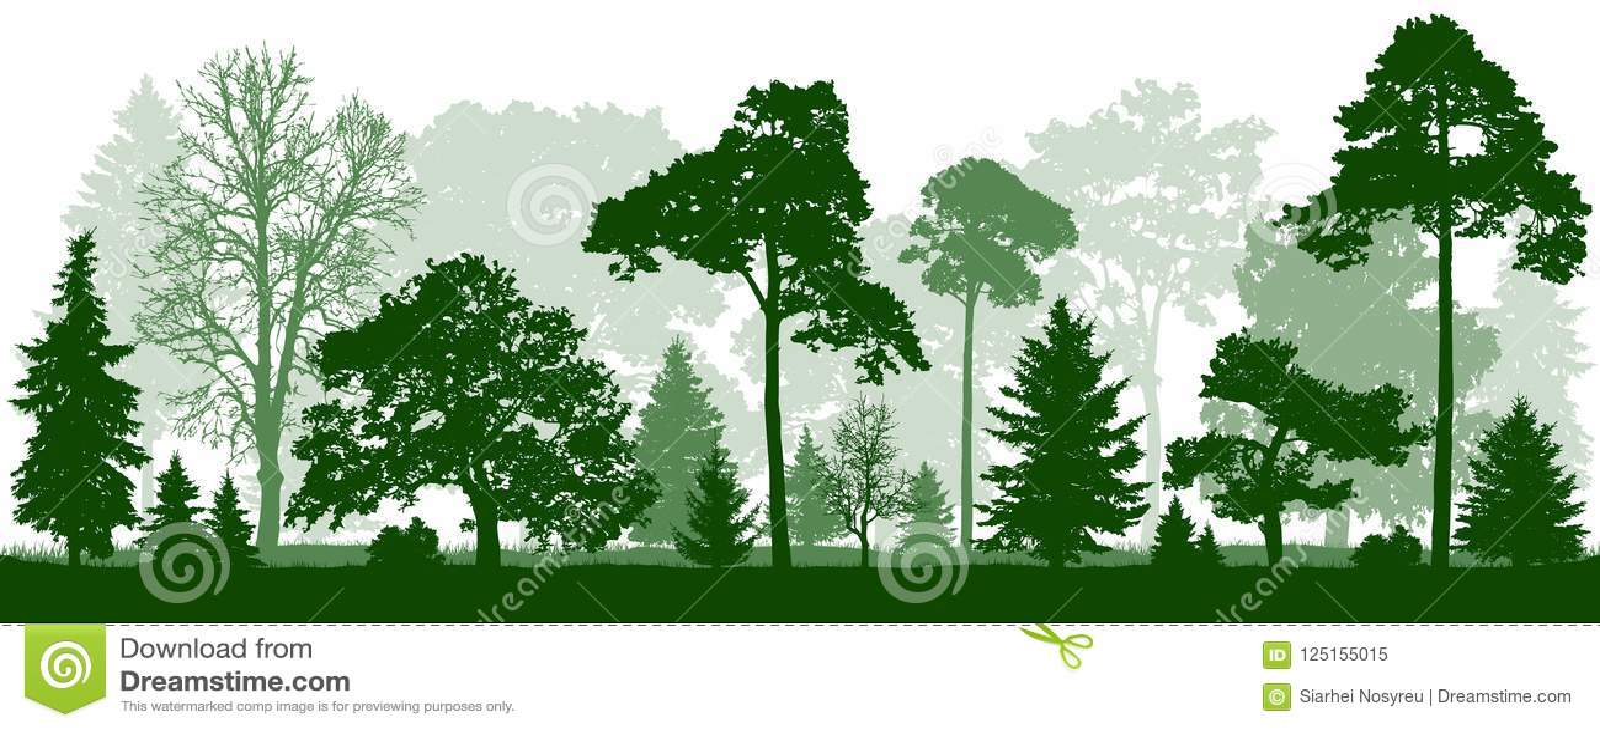 Silueta de los árboles del Forest Green Naturaleza, parque, paisaje